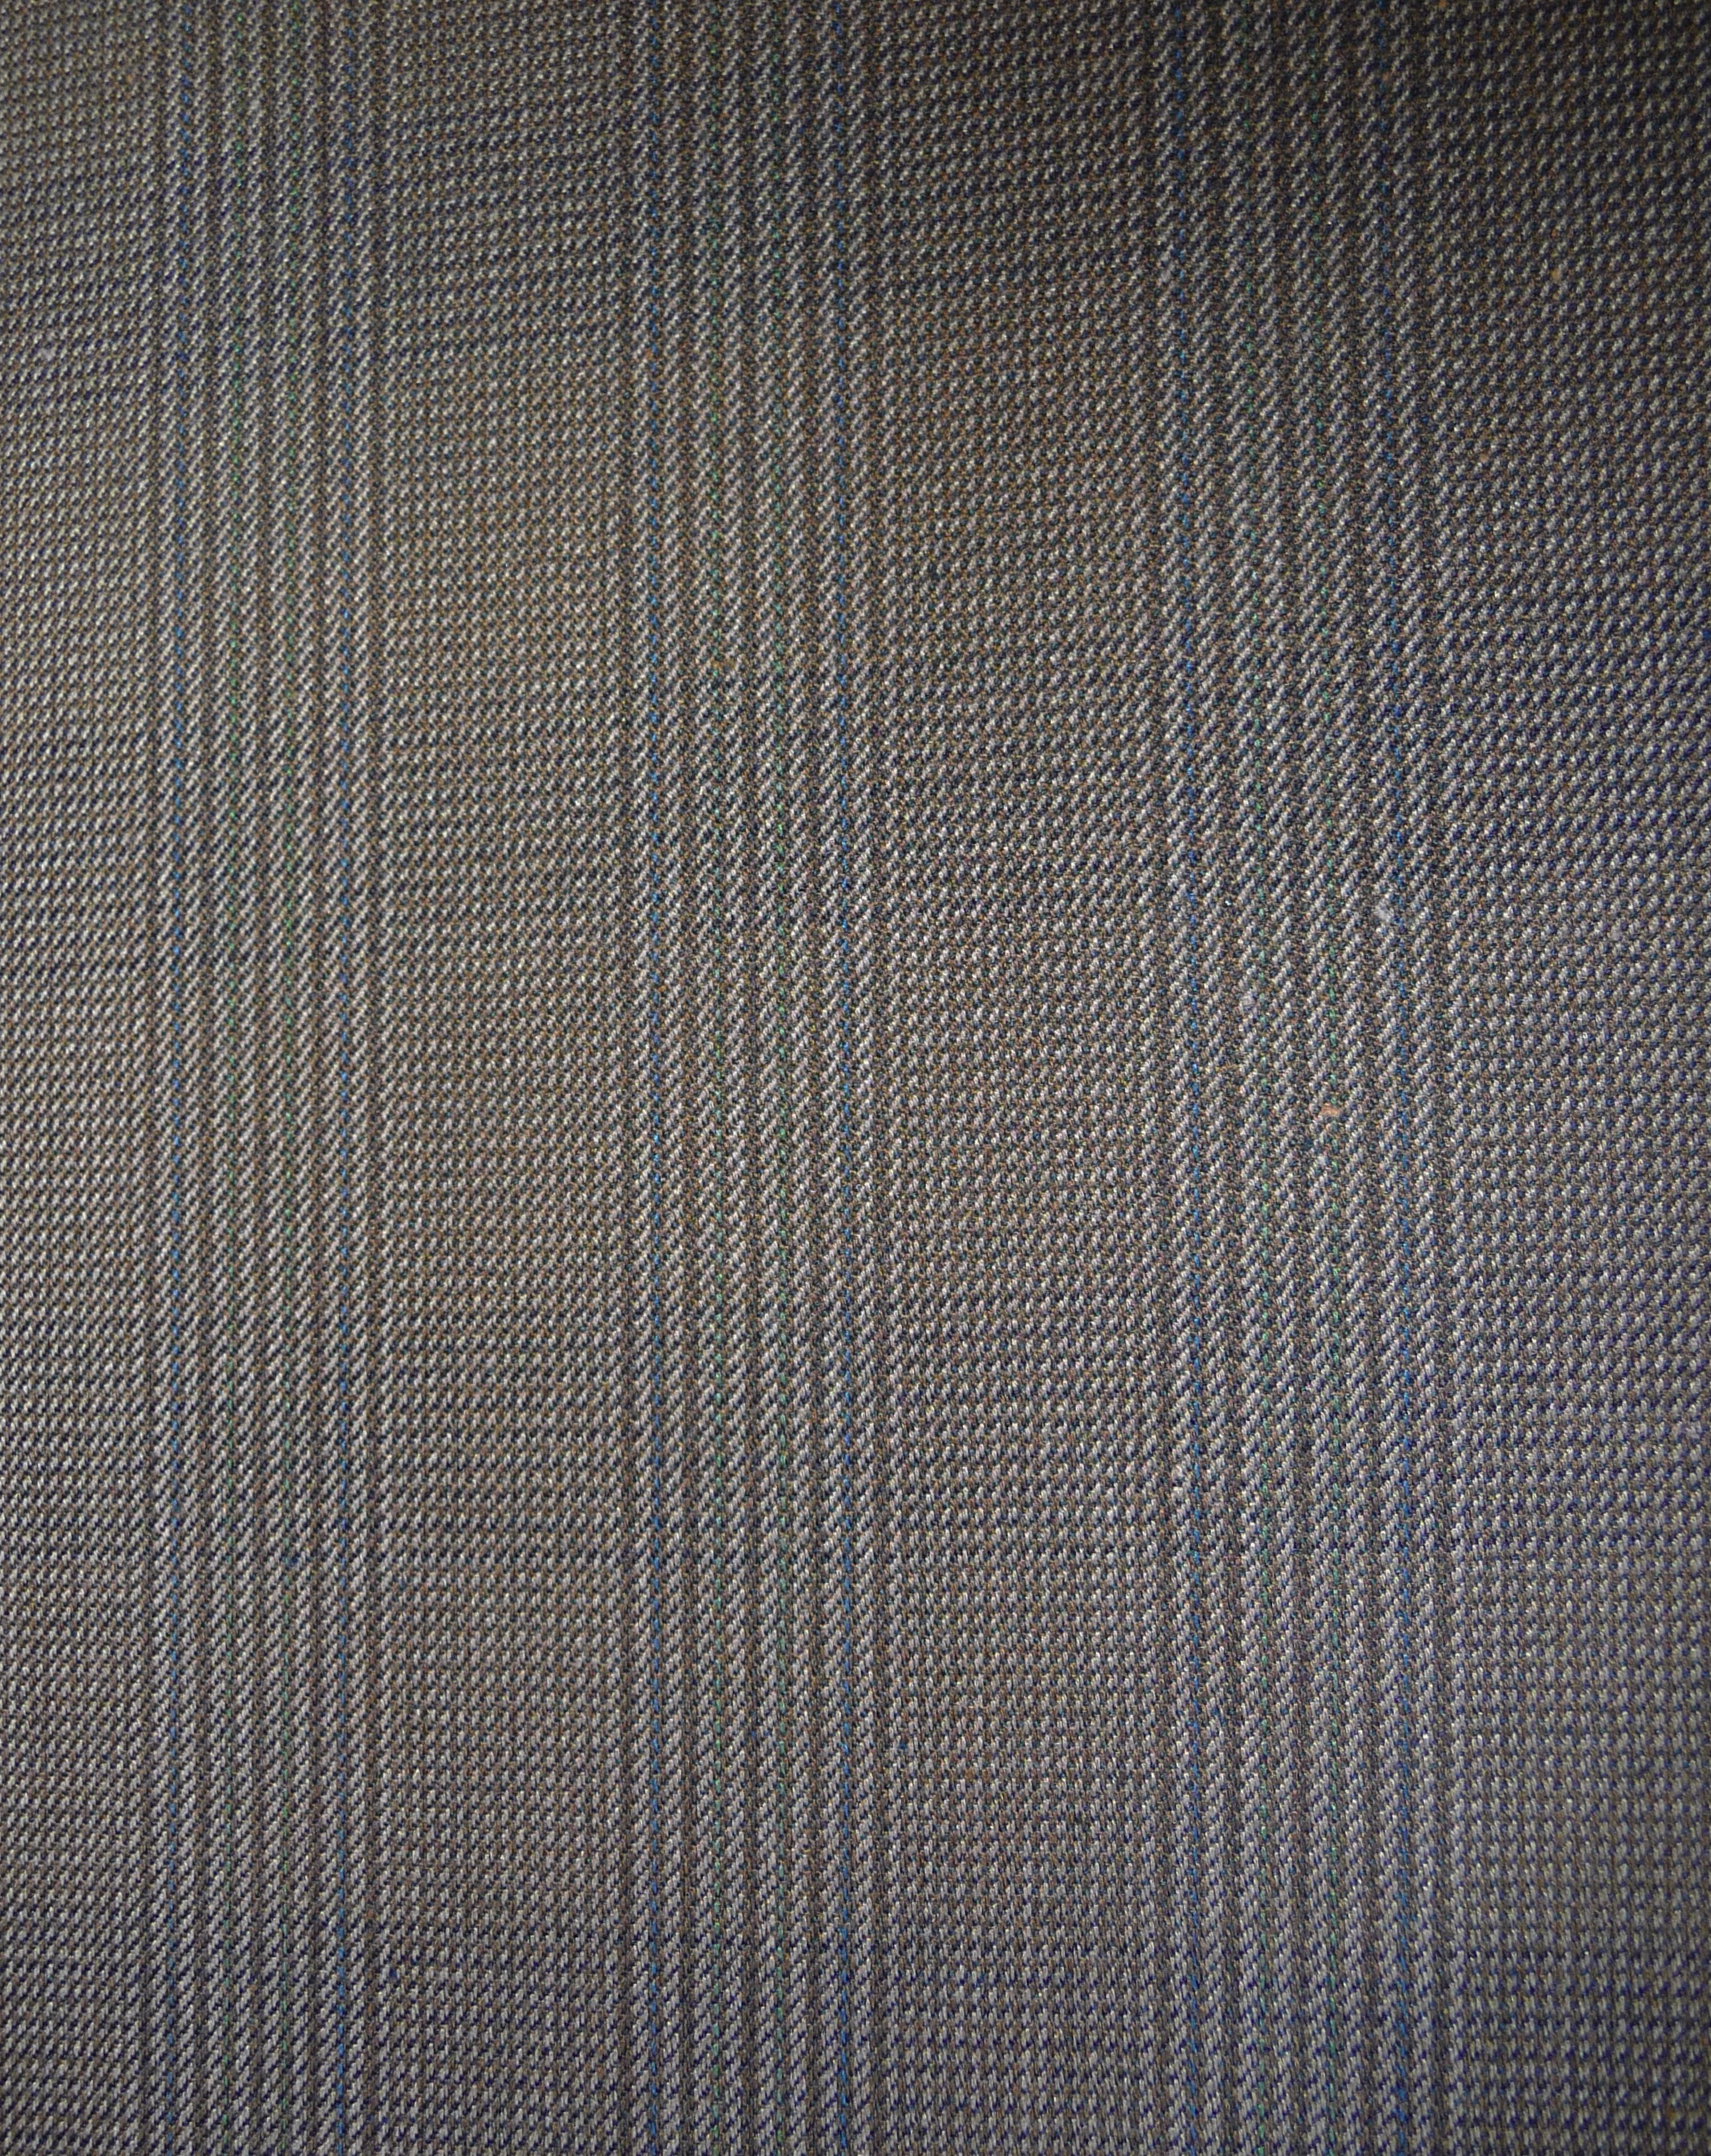 Fabric detail - a wool blend plaid